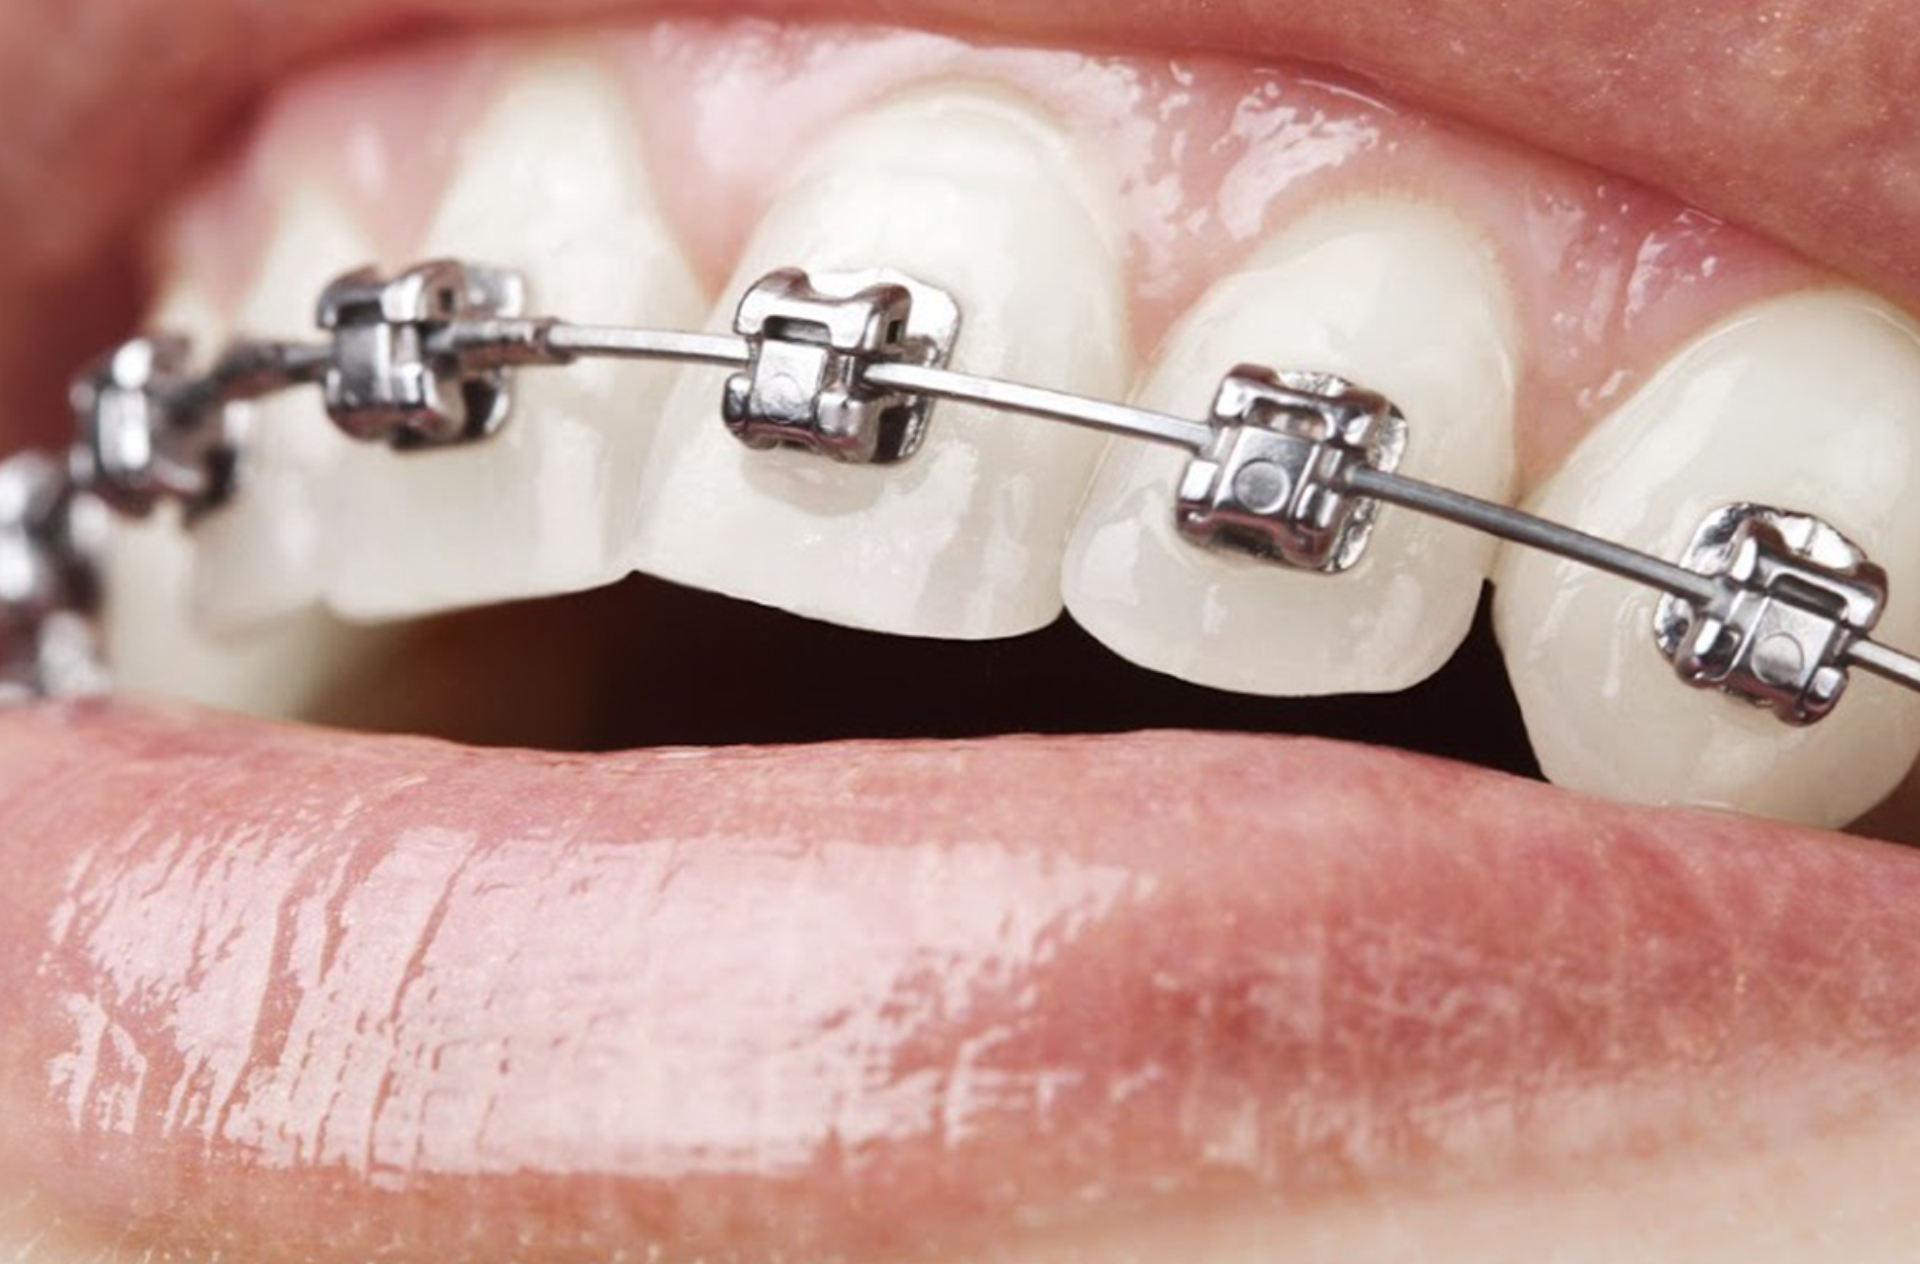 Fixed dental braces (one jaw)